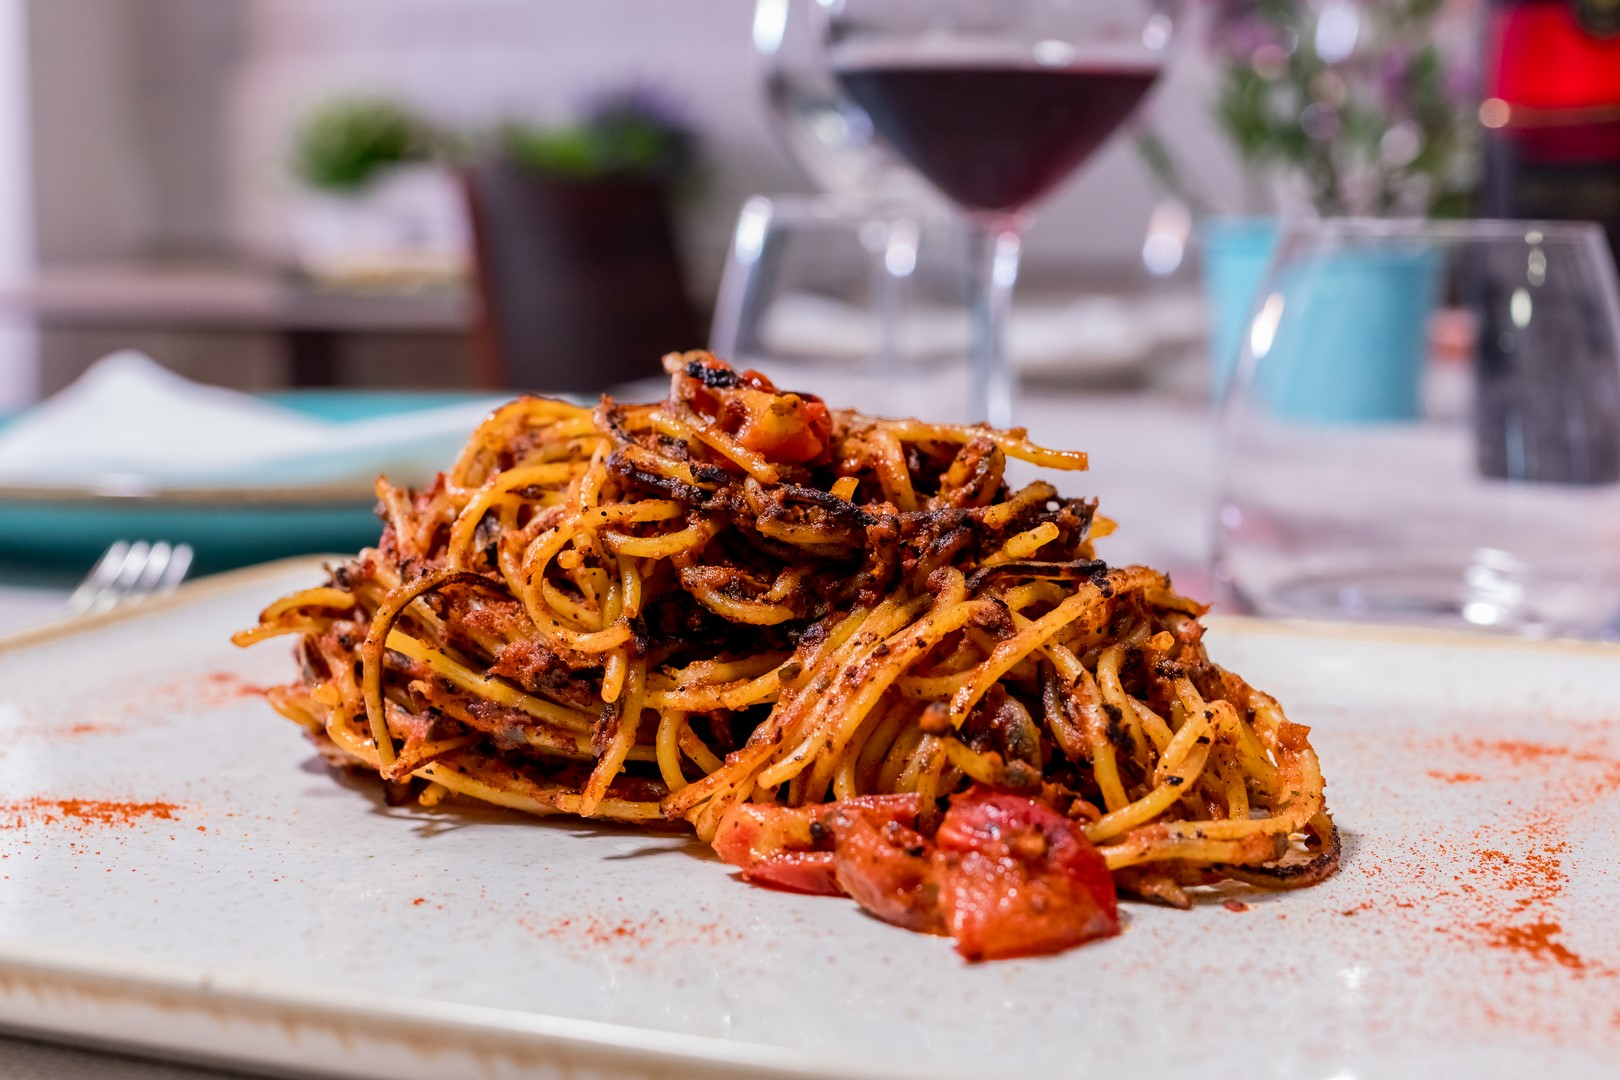 Ristorante da Paolo - Bari, cucina tipica Barese